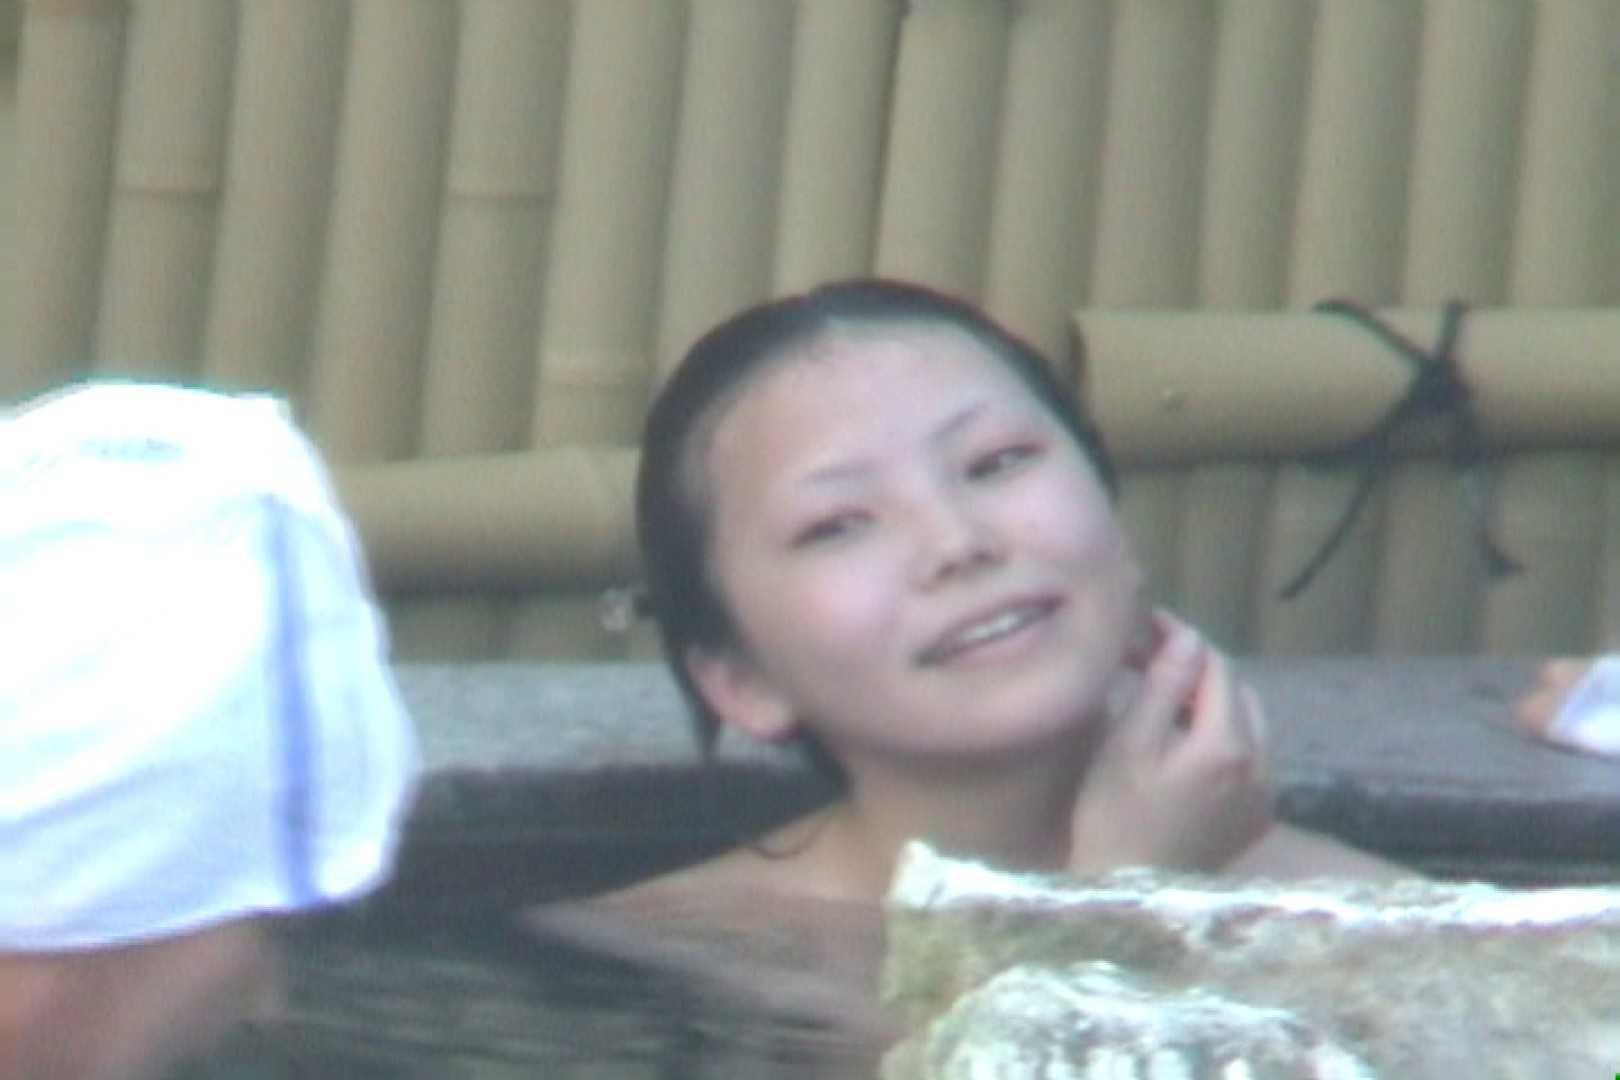 Aquaな露天風呂Vol.572 盗撮 | OLエロ画像  67PICs 46